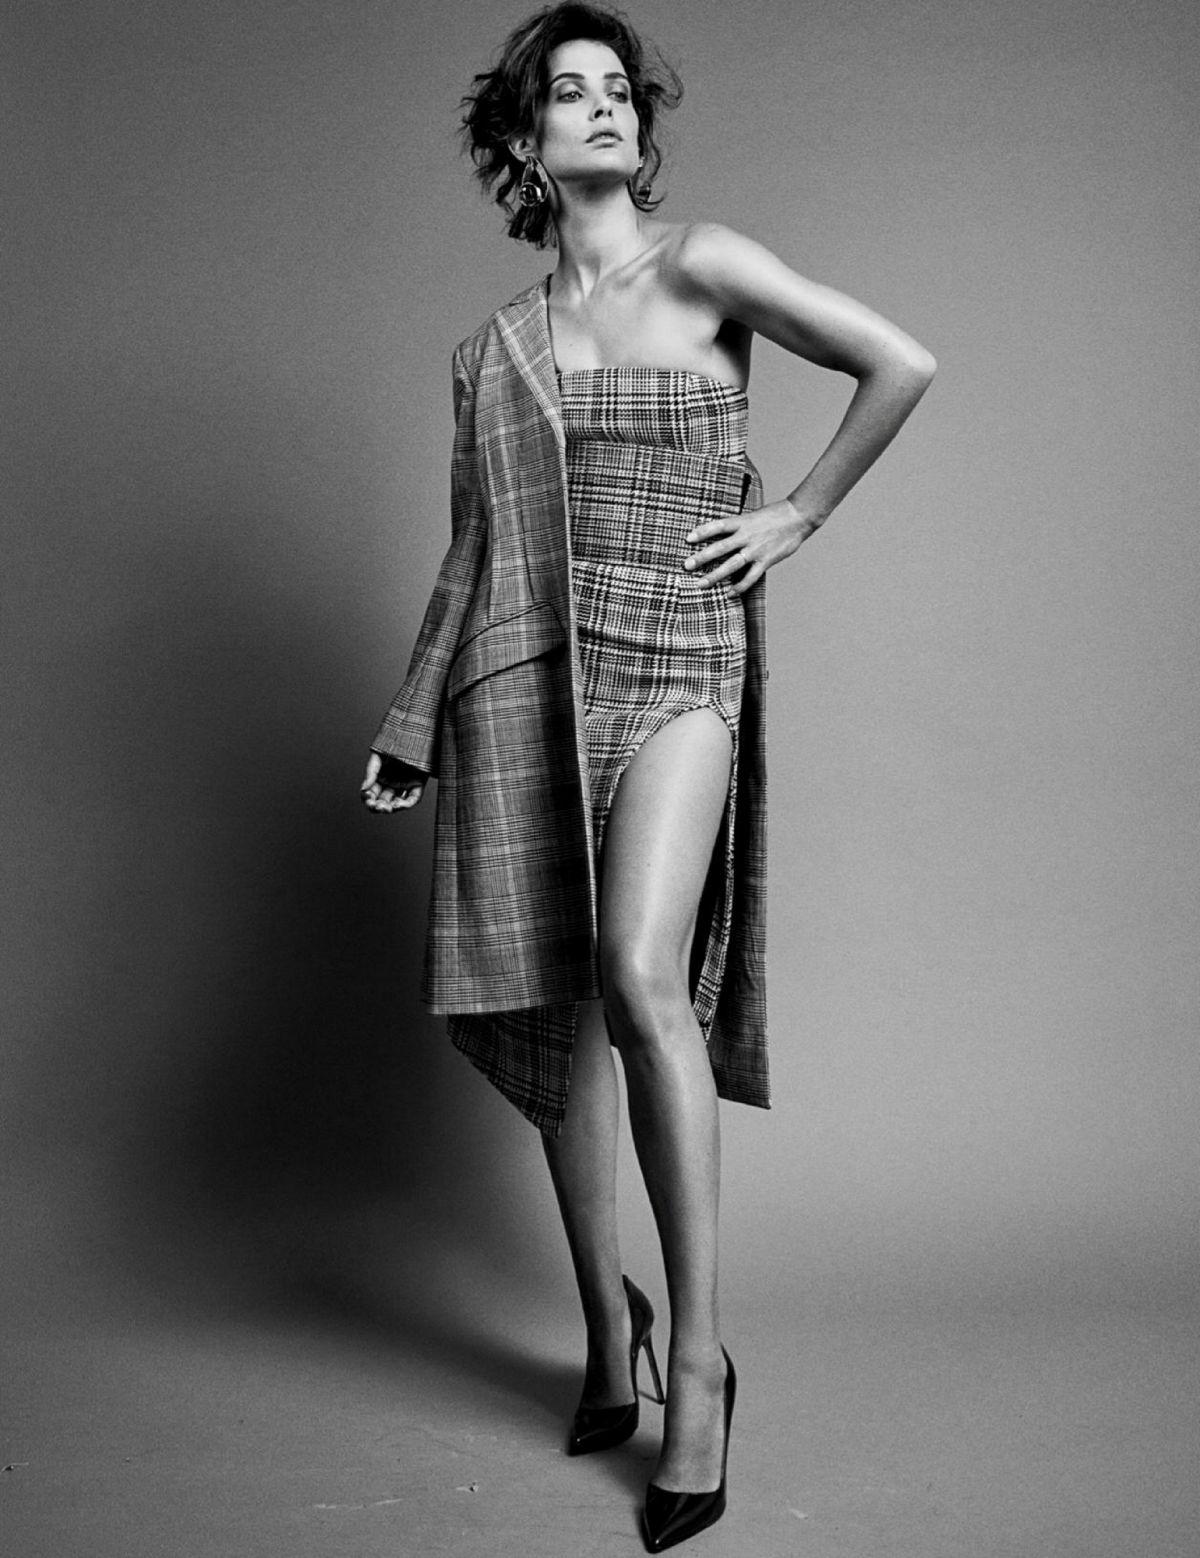 Коби Смолдерс фото (Cobie Smulders) photo